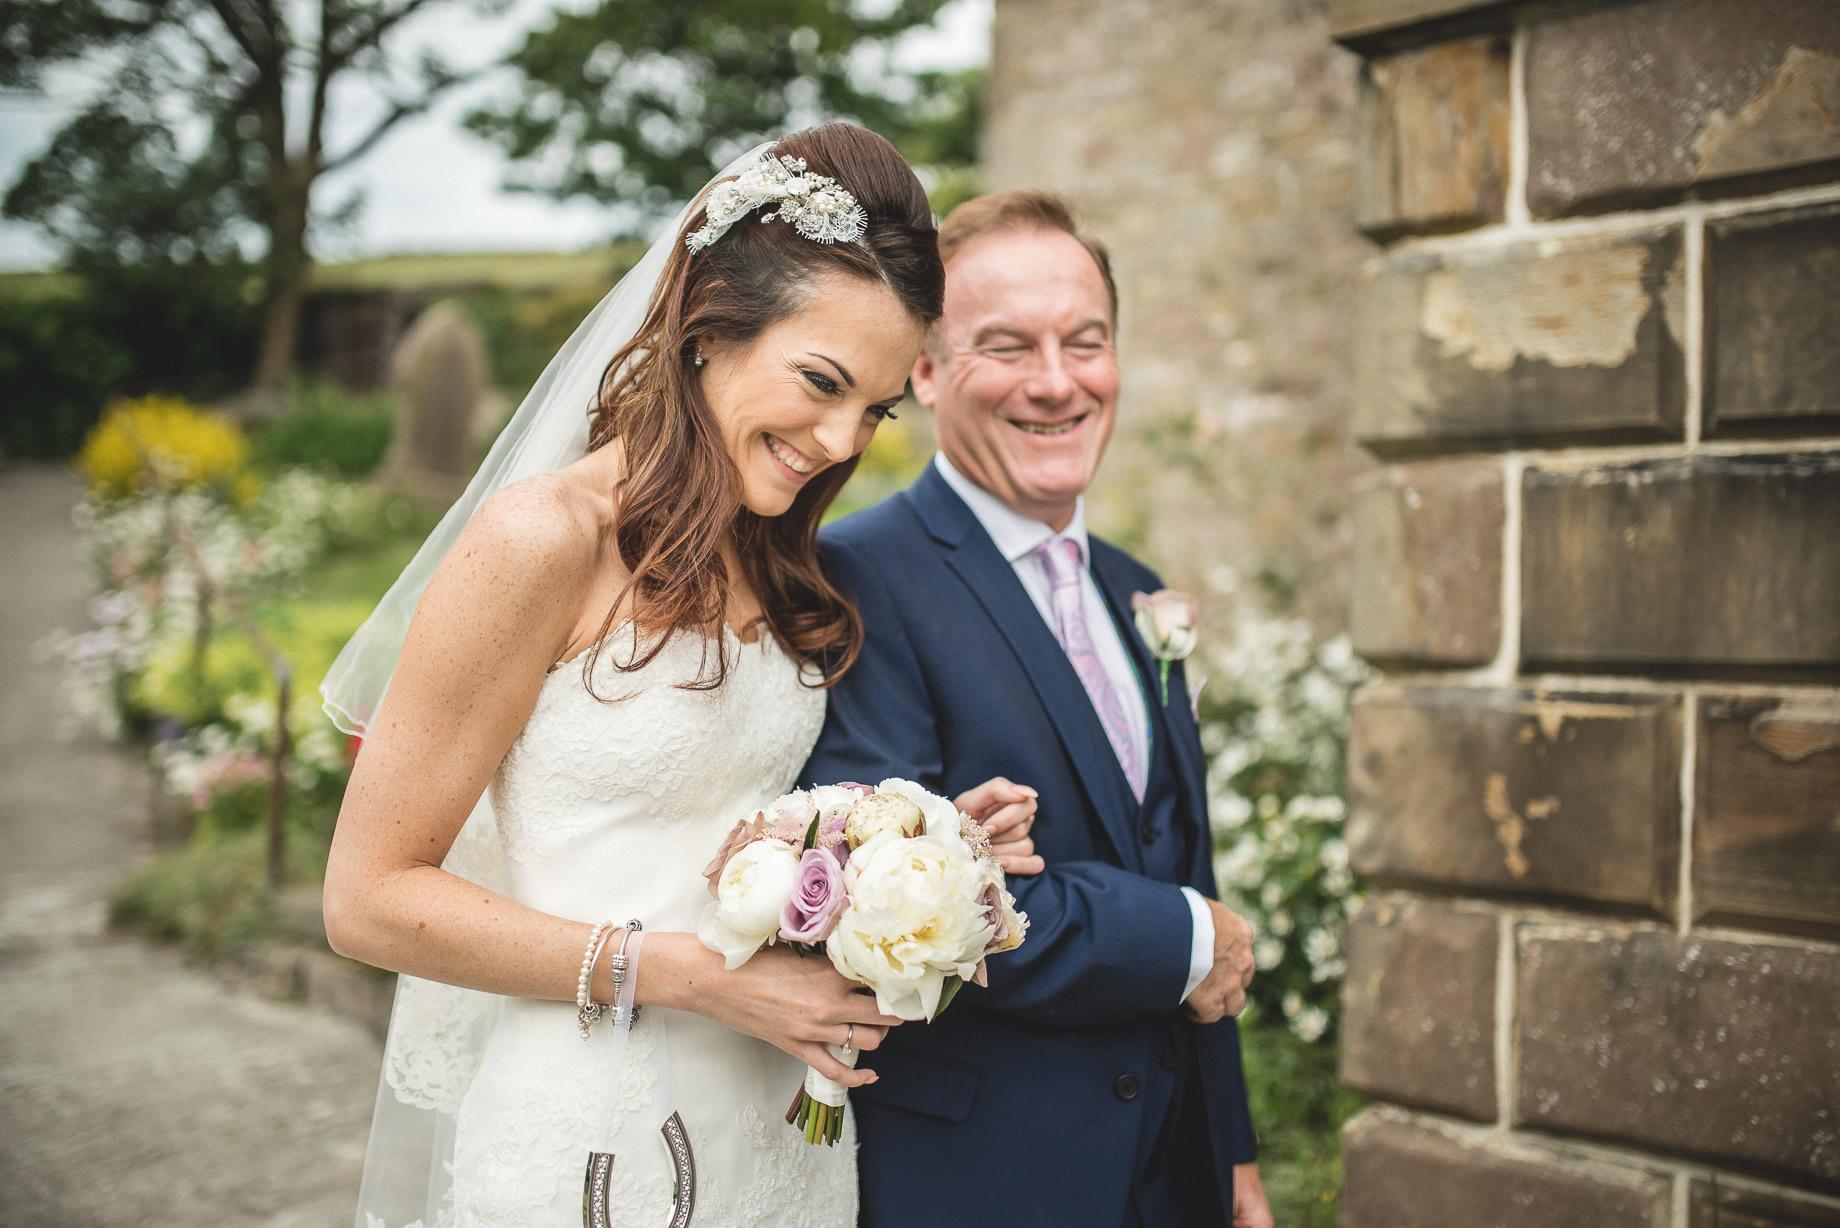 Helen and Matt's Wedding at Mitton Hall 037